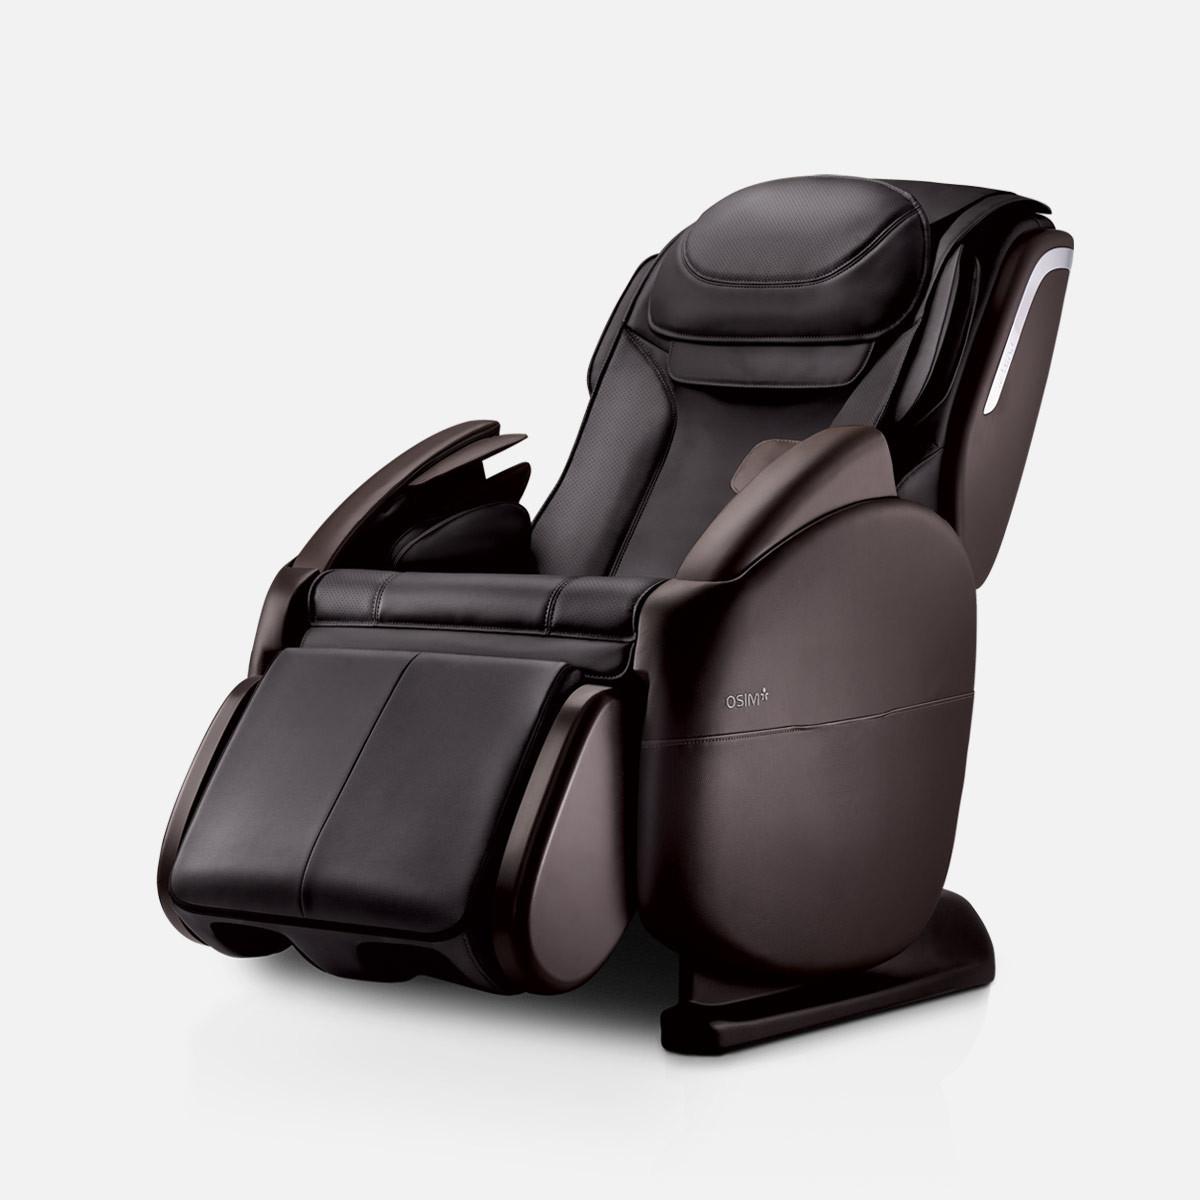 Osim Massage Chairs Olx Com Pk